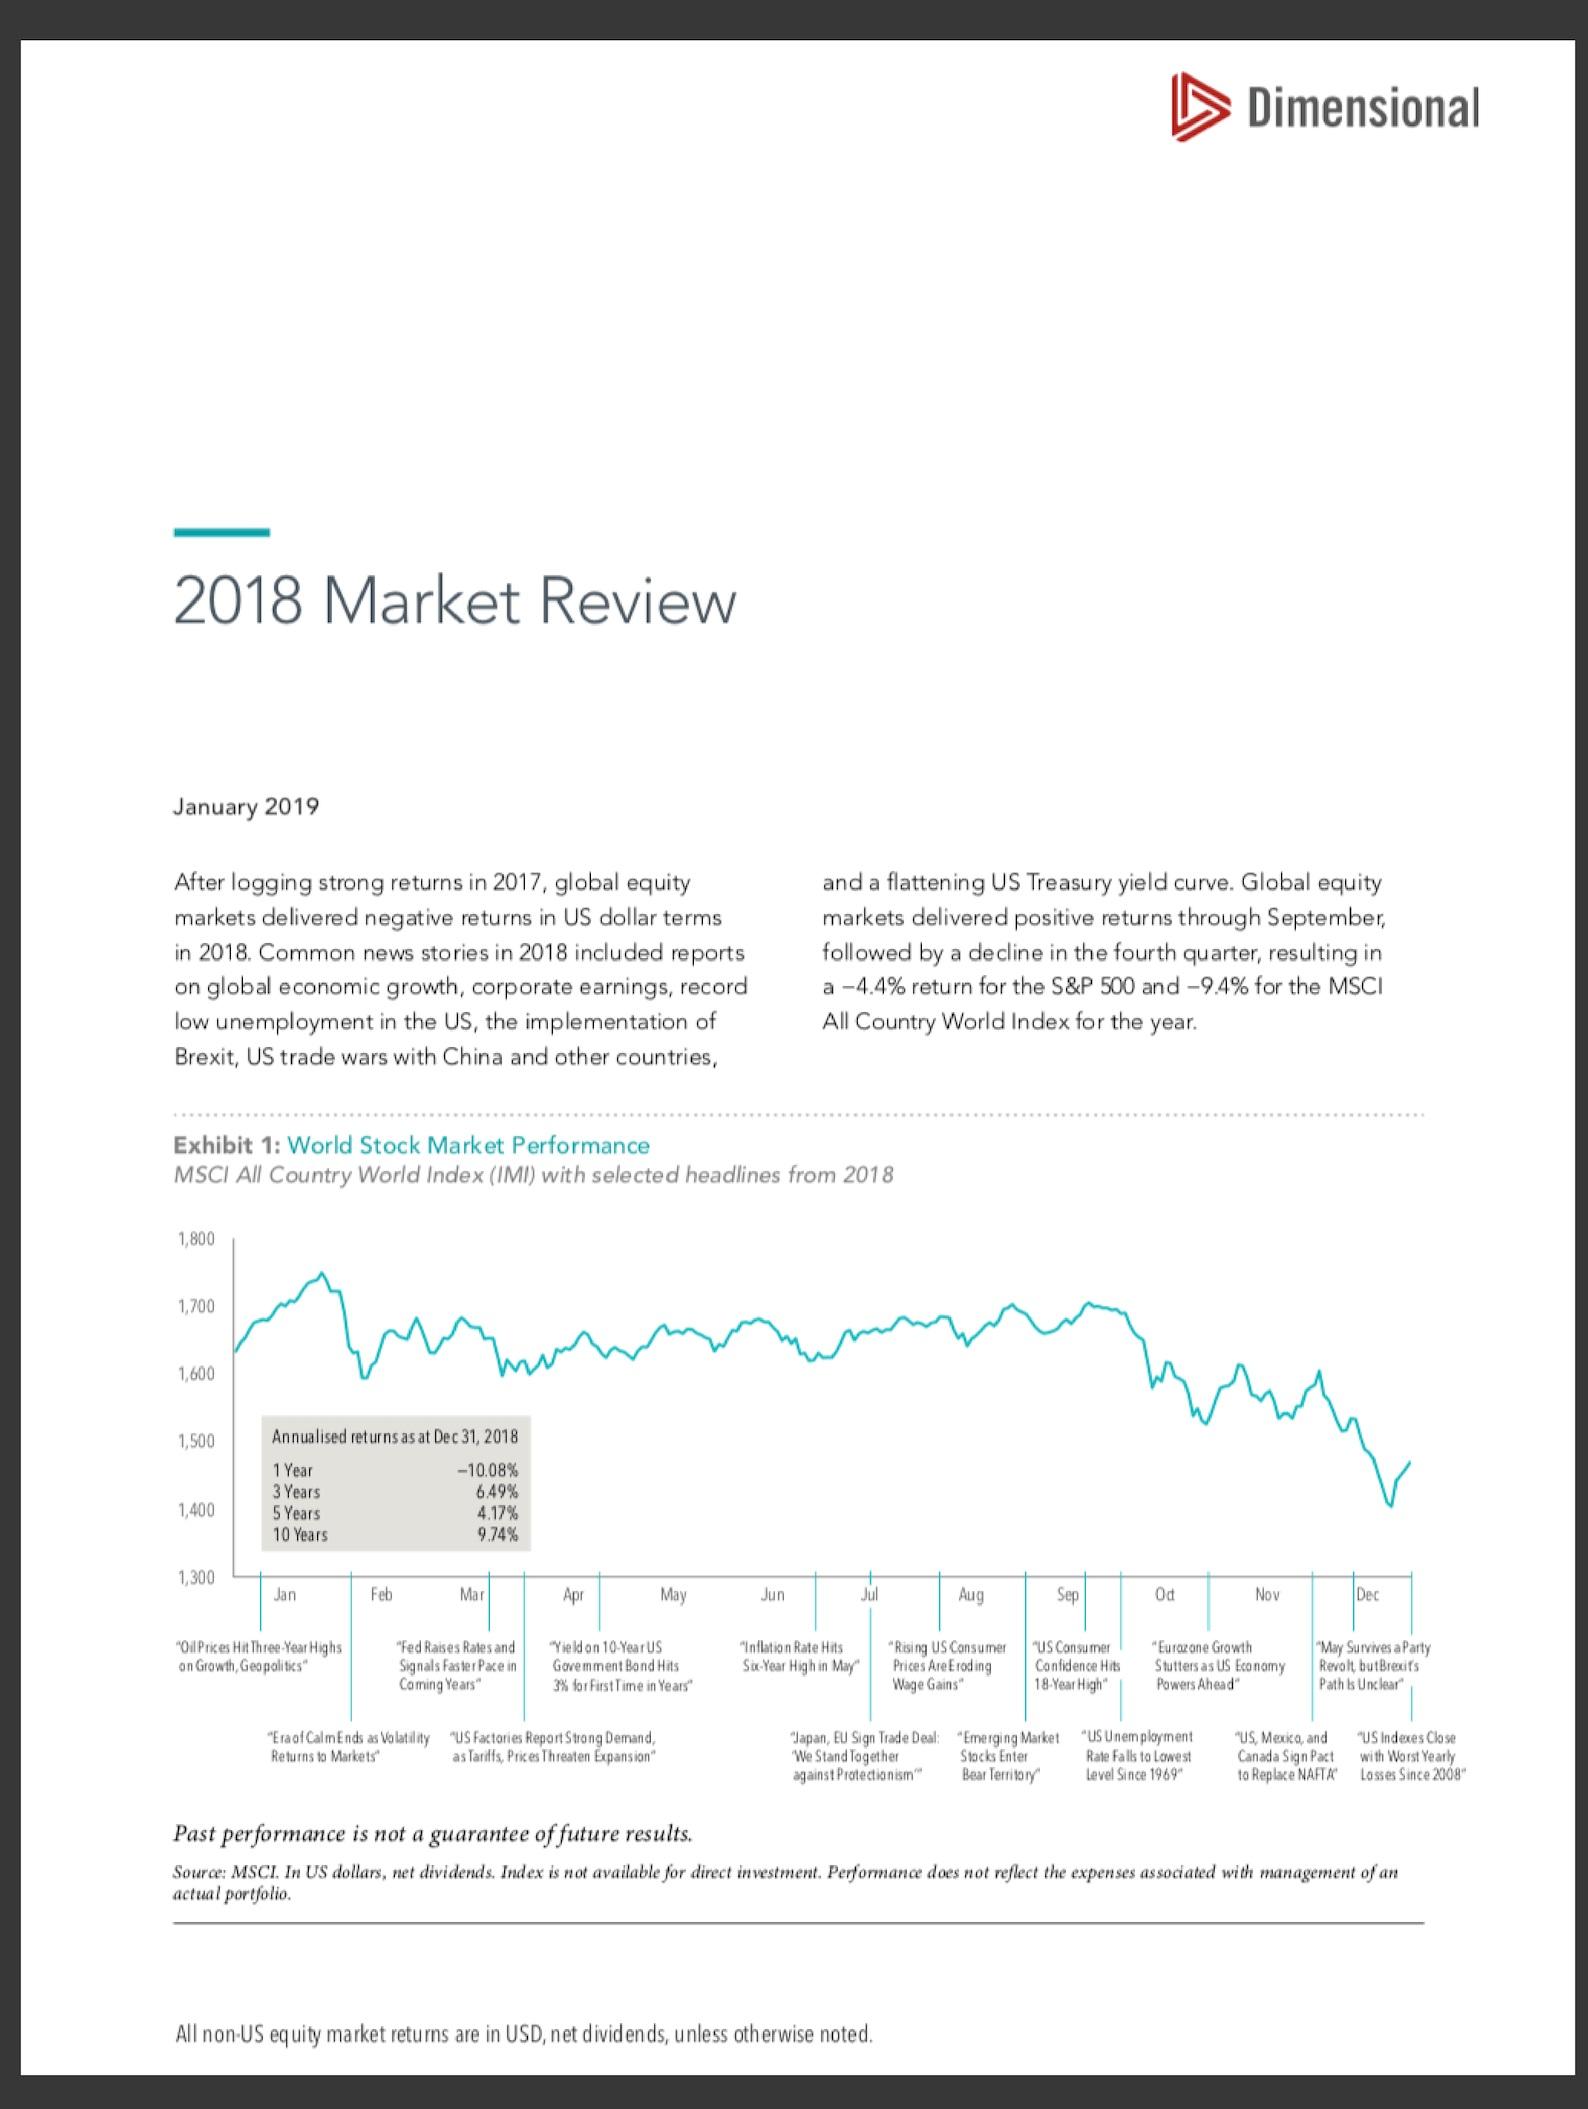 DFA 2018 Market Review